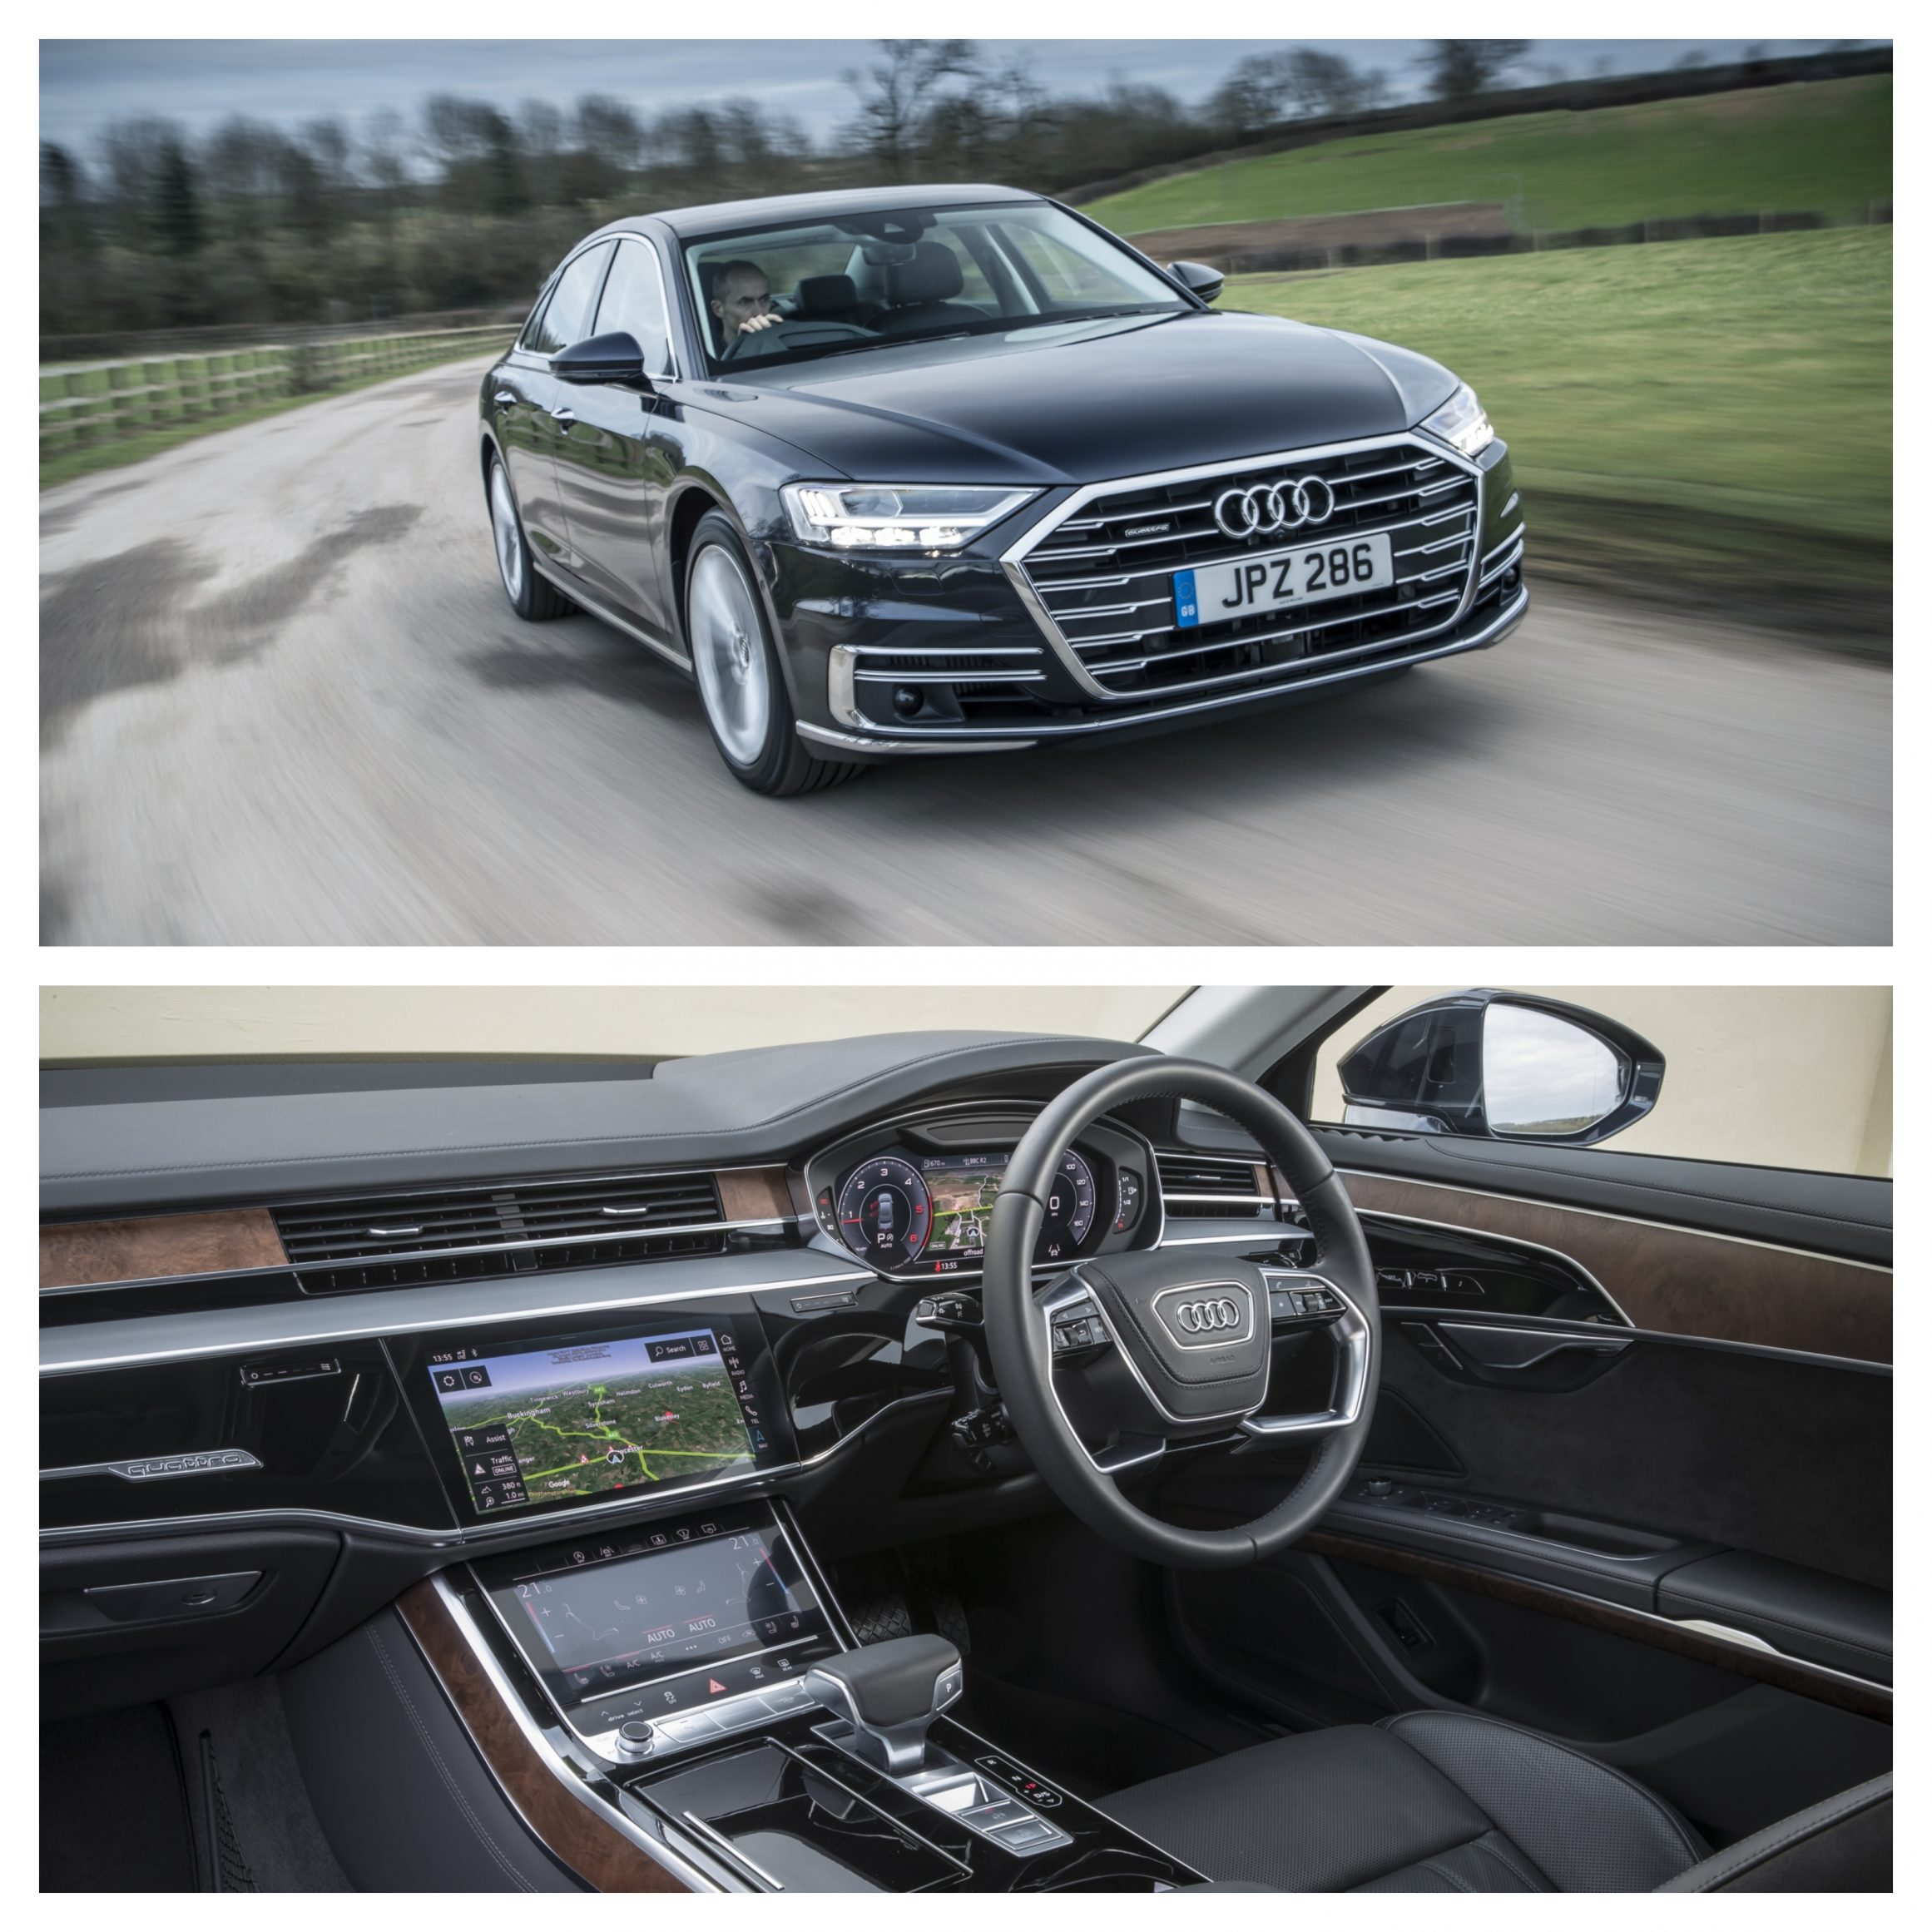 Audi A8 - best automatic cars 2021